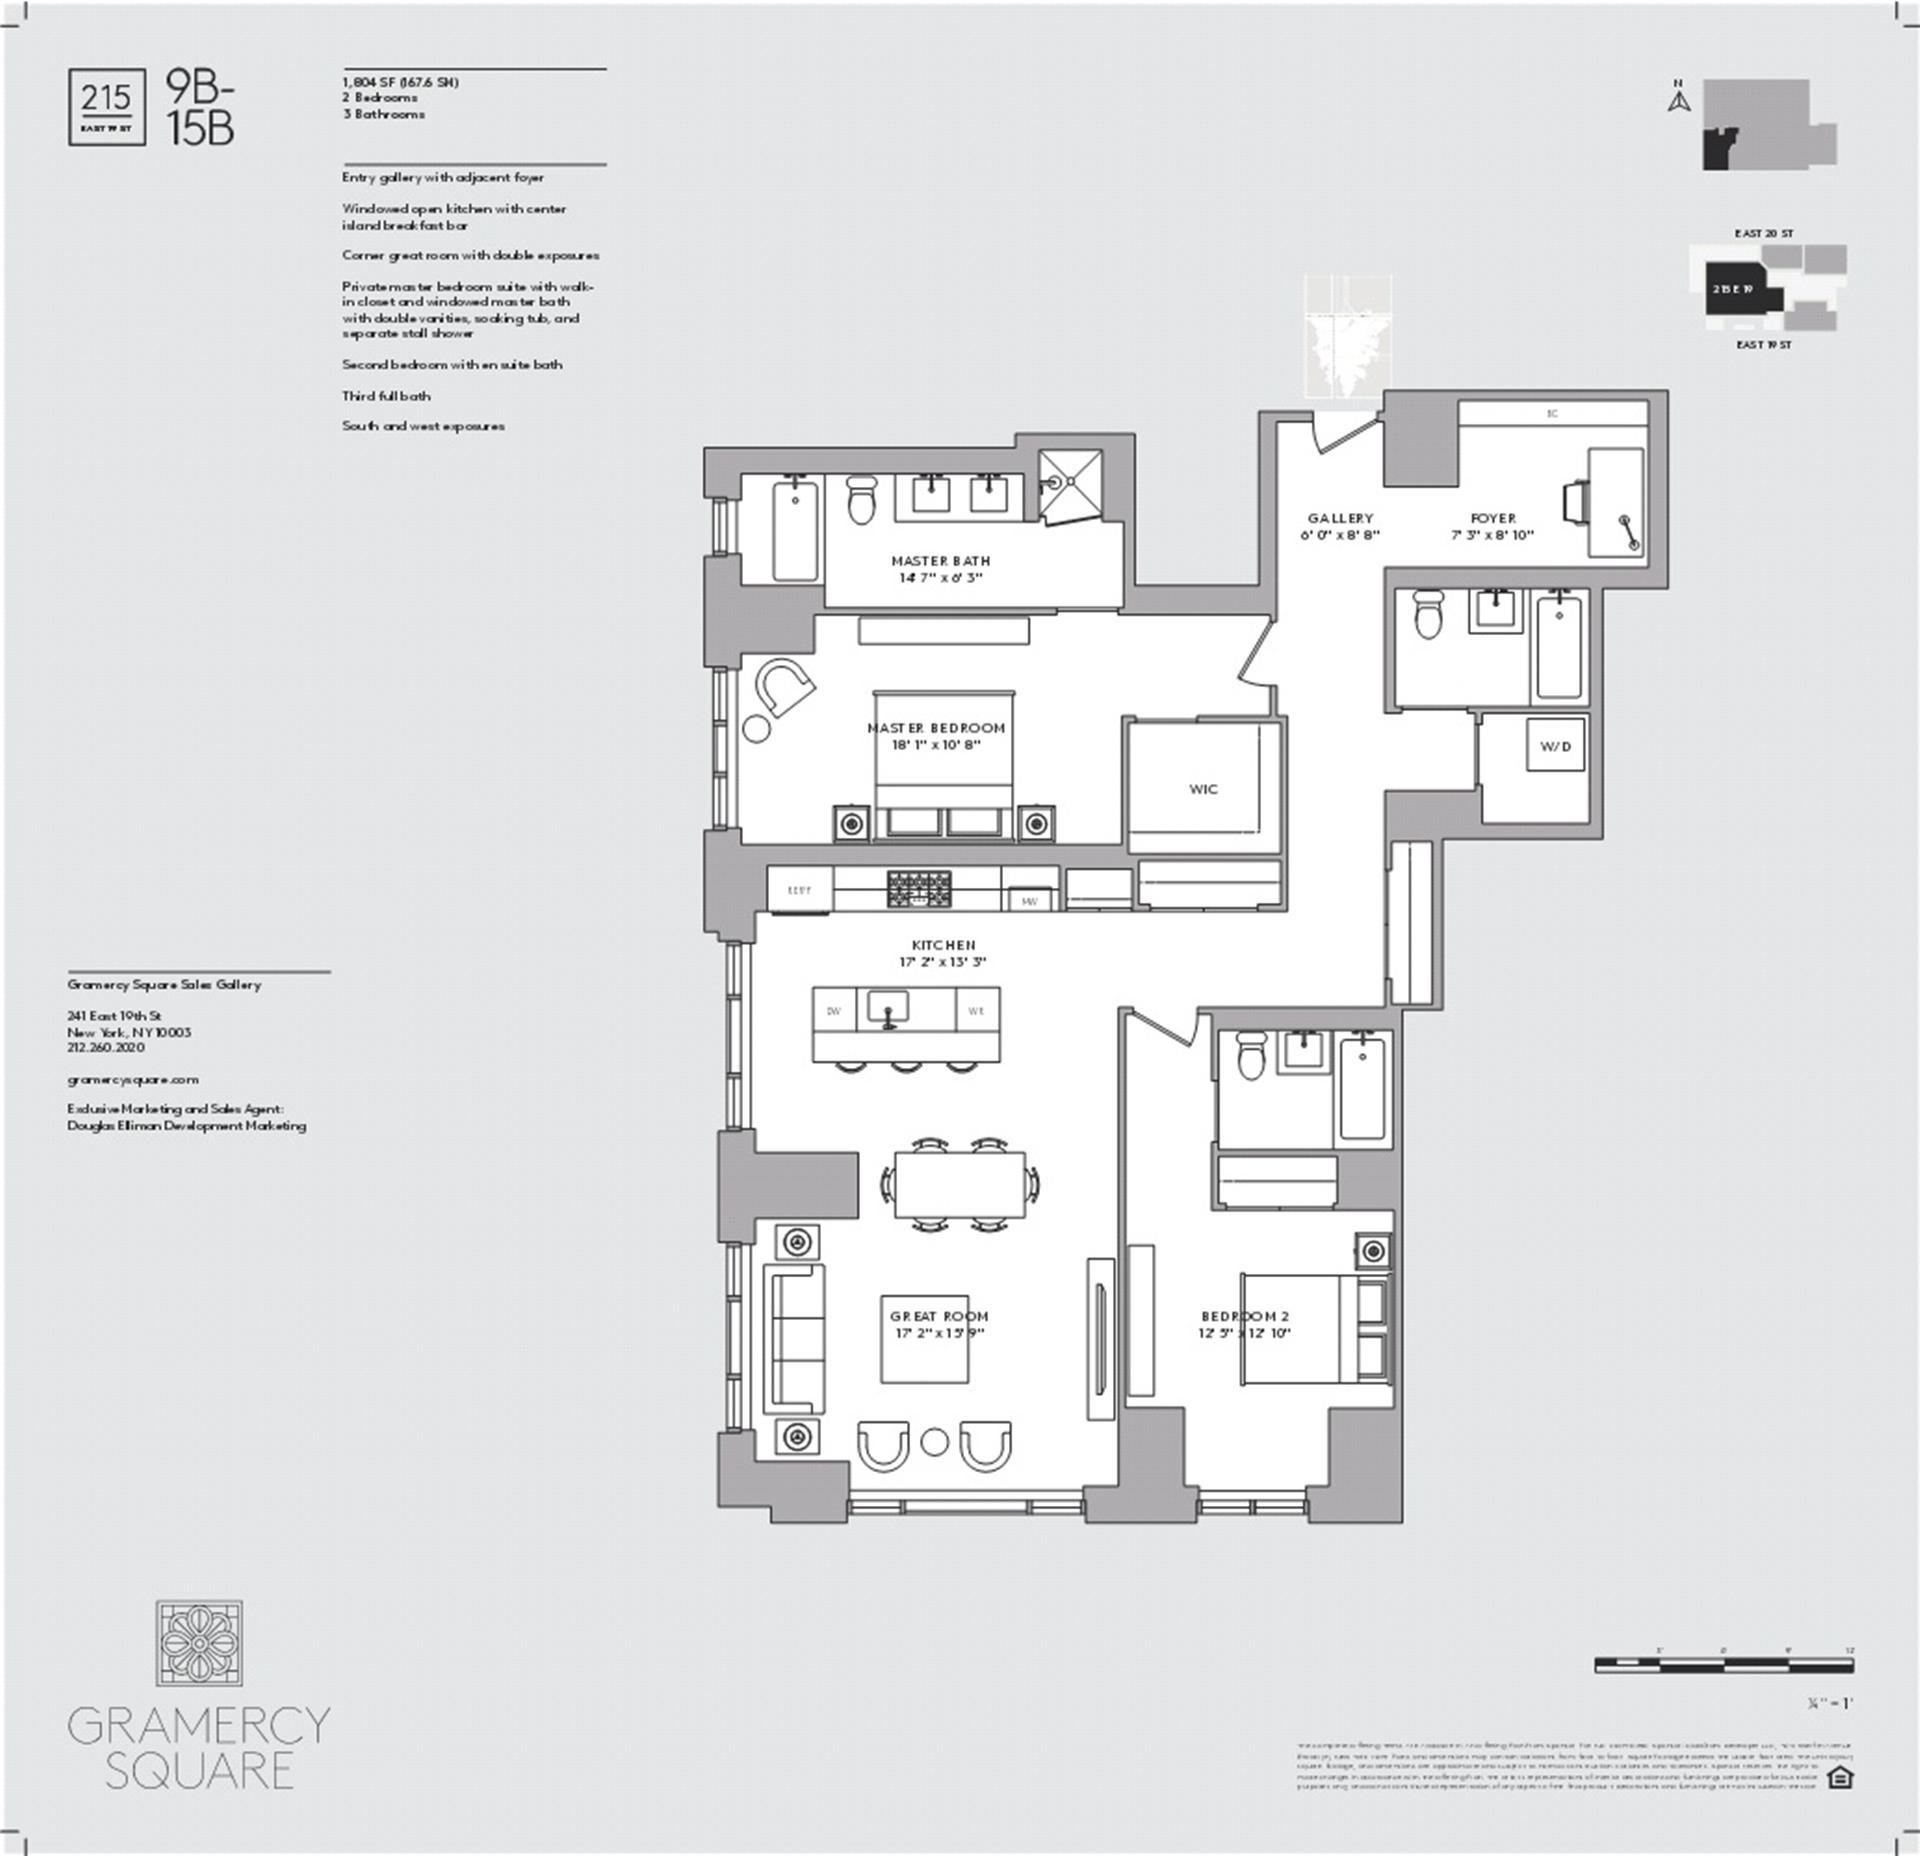 Floor plan of Gramercy Square, 215 East 19th St, 14B - Gramercy - Union Square, New York